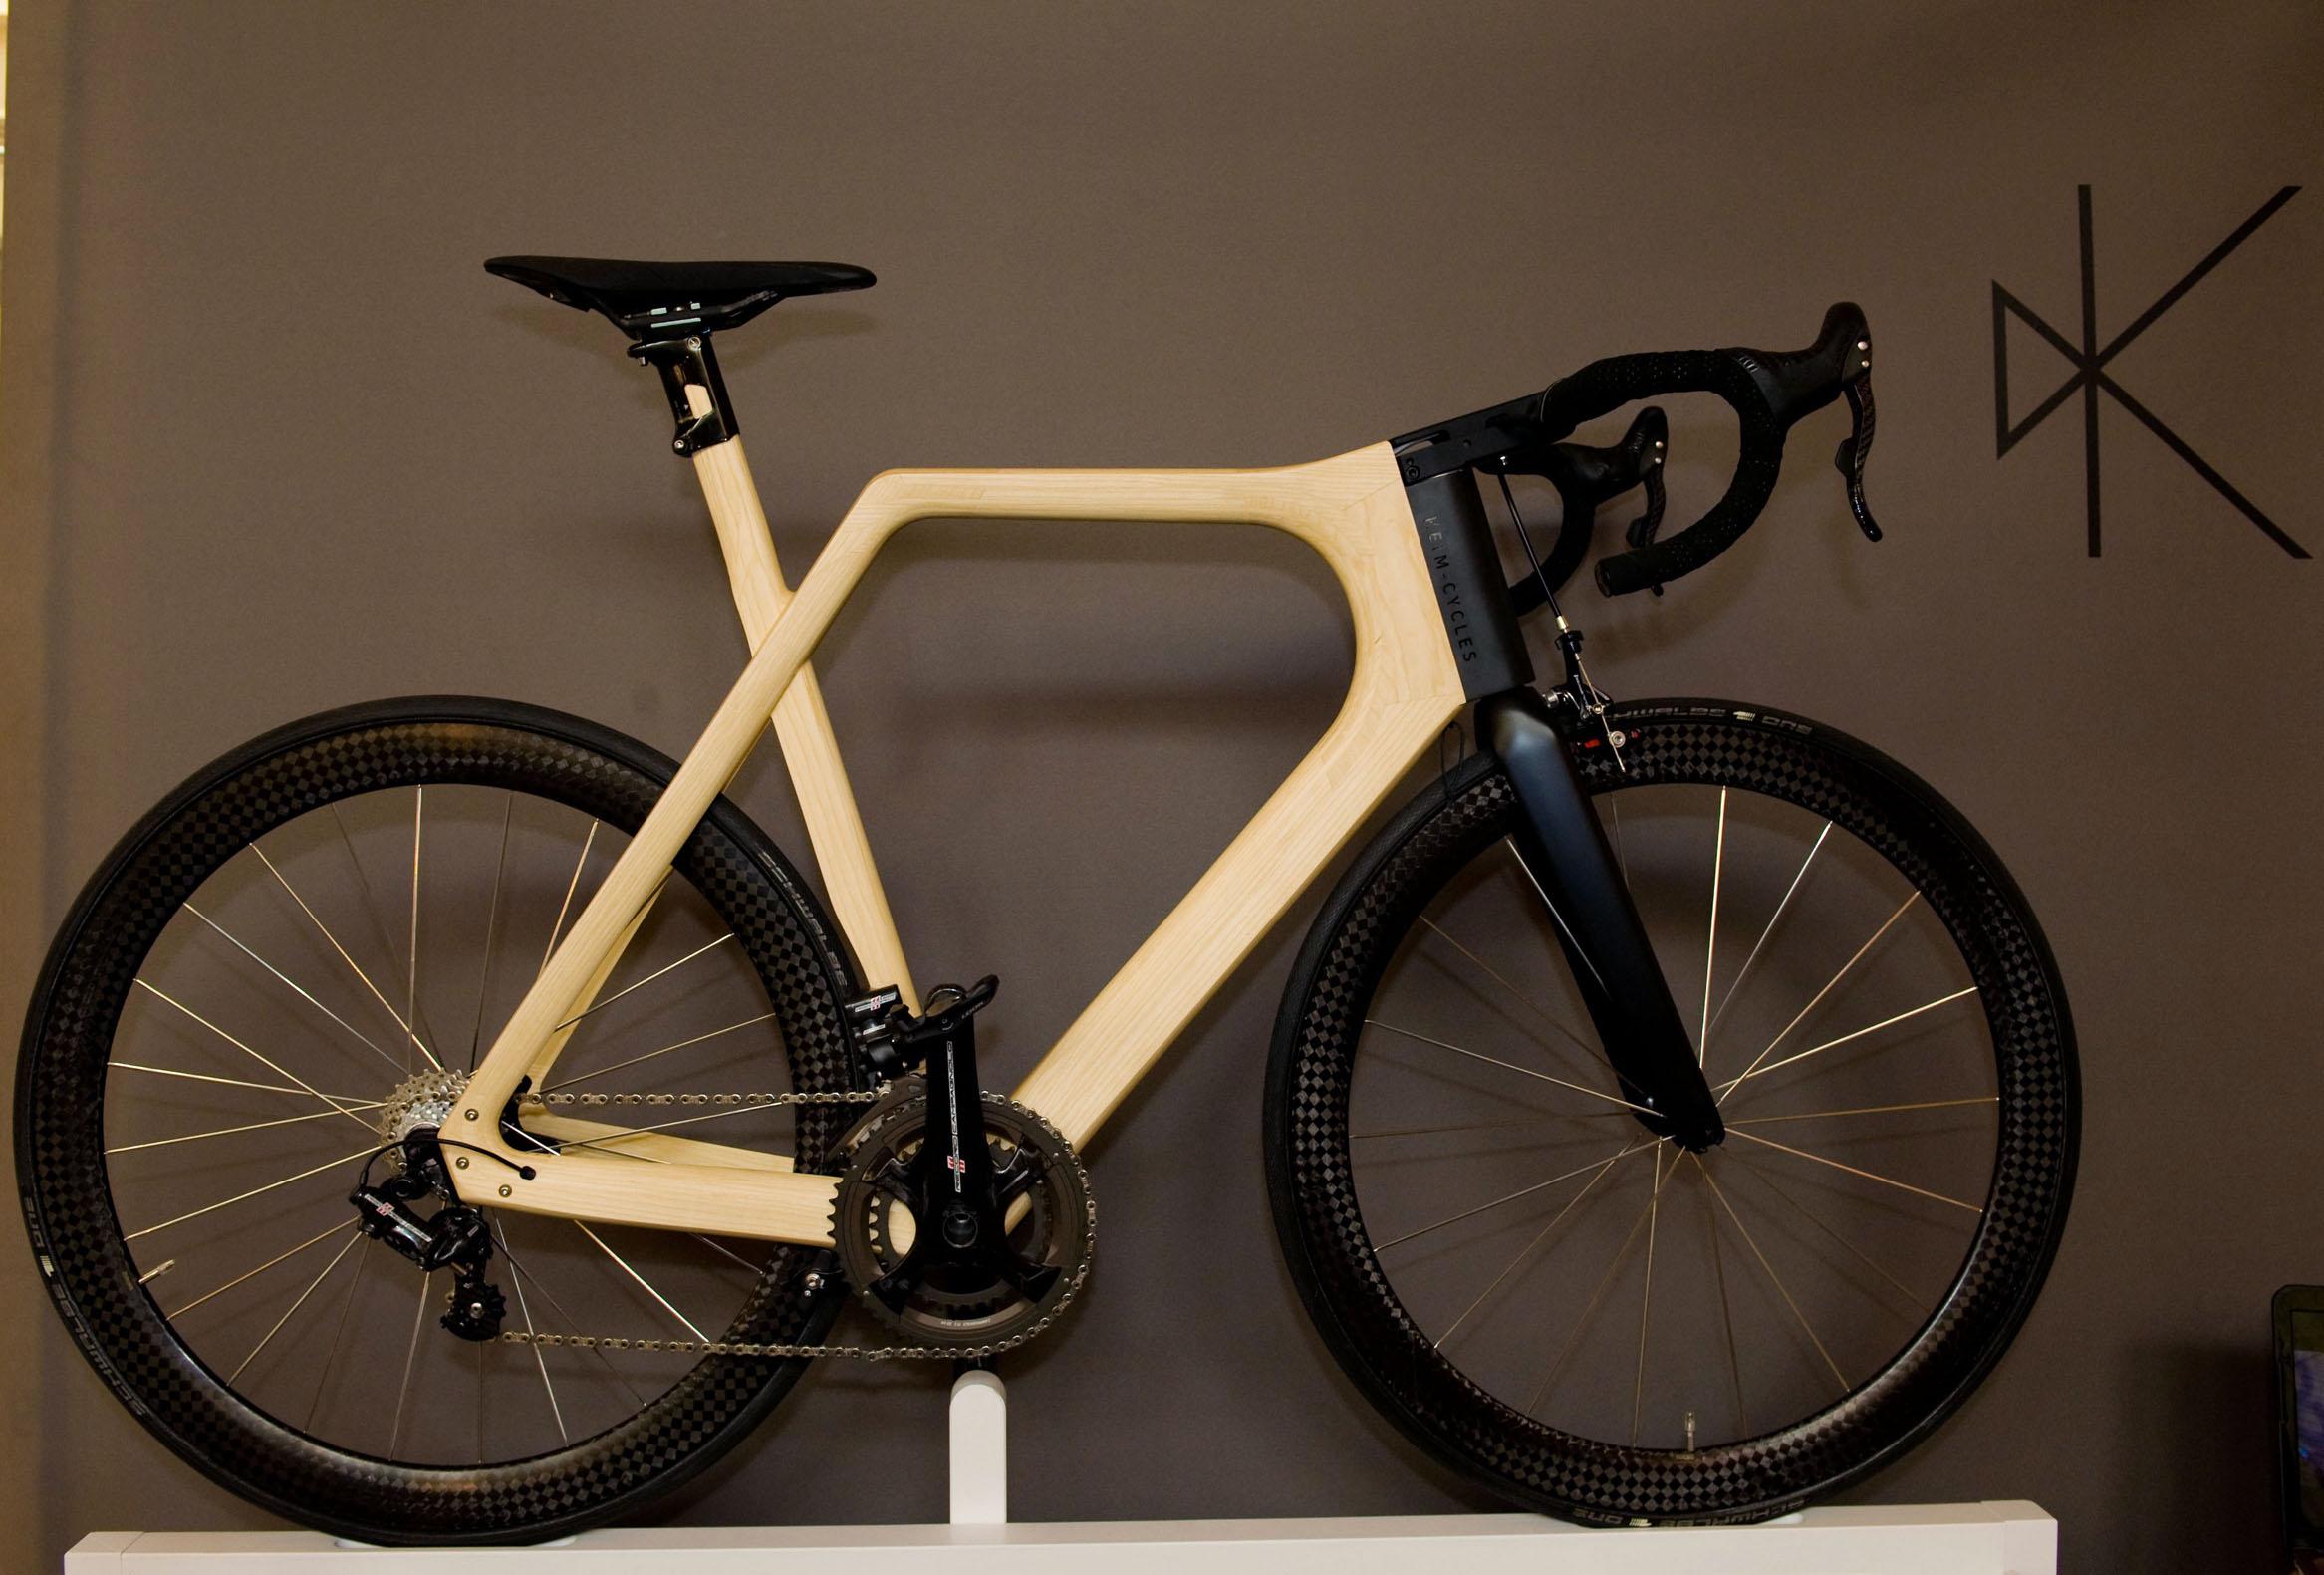 Six stunning bikes from the Bespoked Bristol bike show (video)